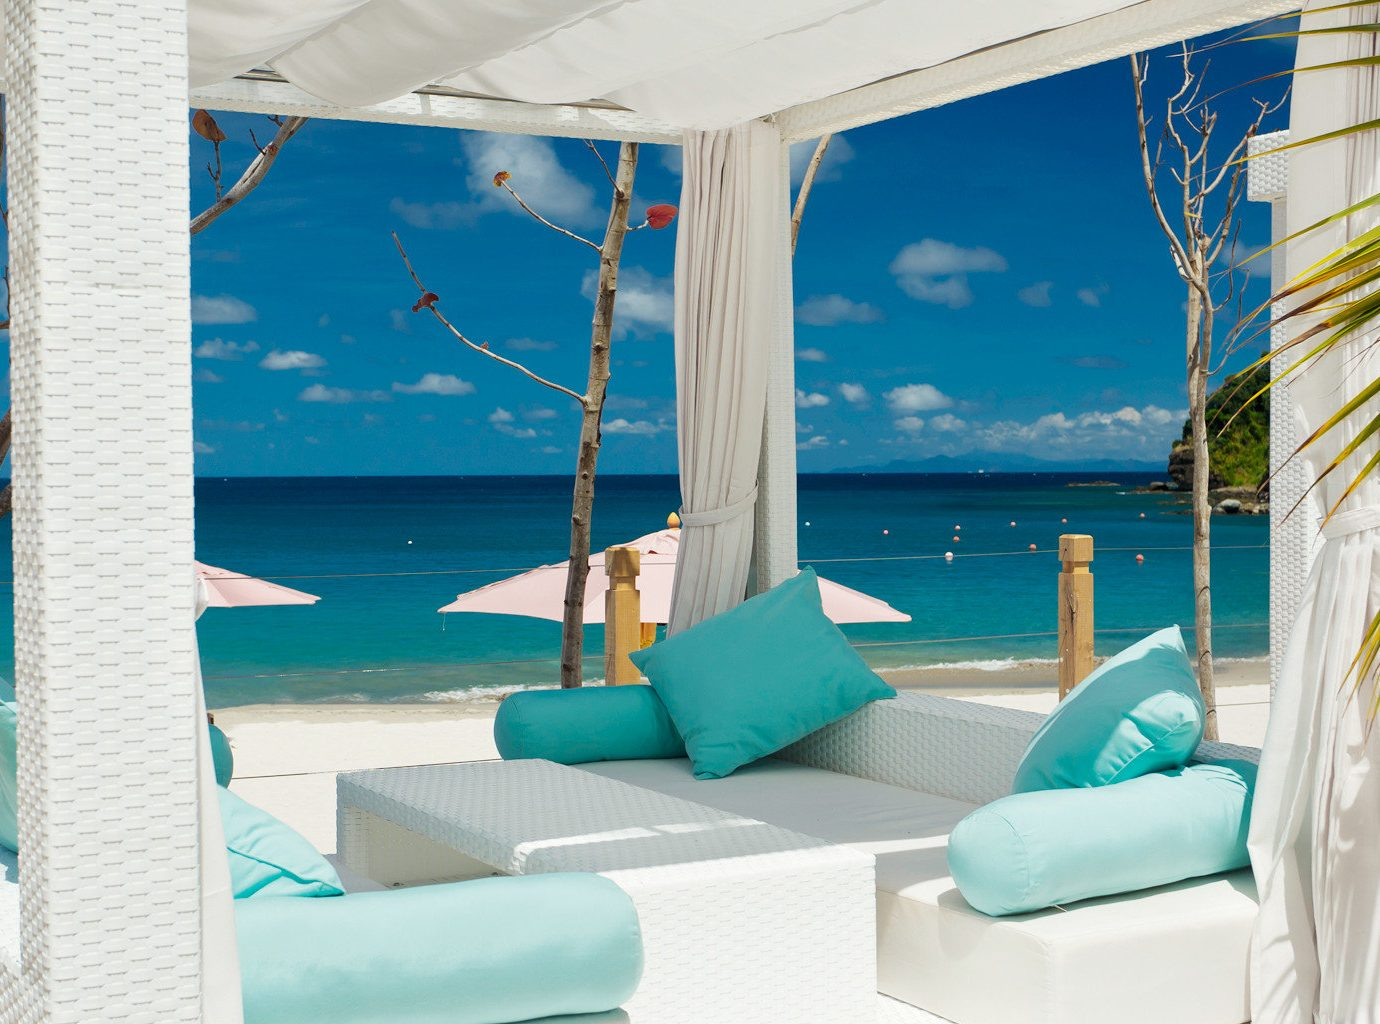 Beach Beachfront Hotels Island Living Wellness blue room chair swimming pool caribbean vacation Resort interior design estate Villa apartment furniture several